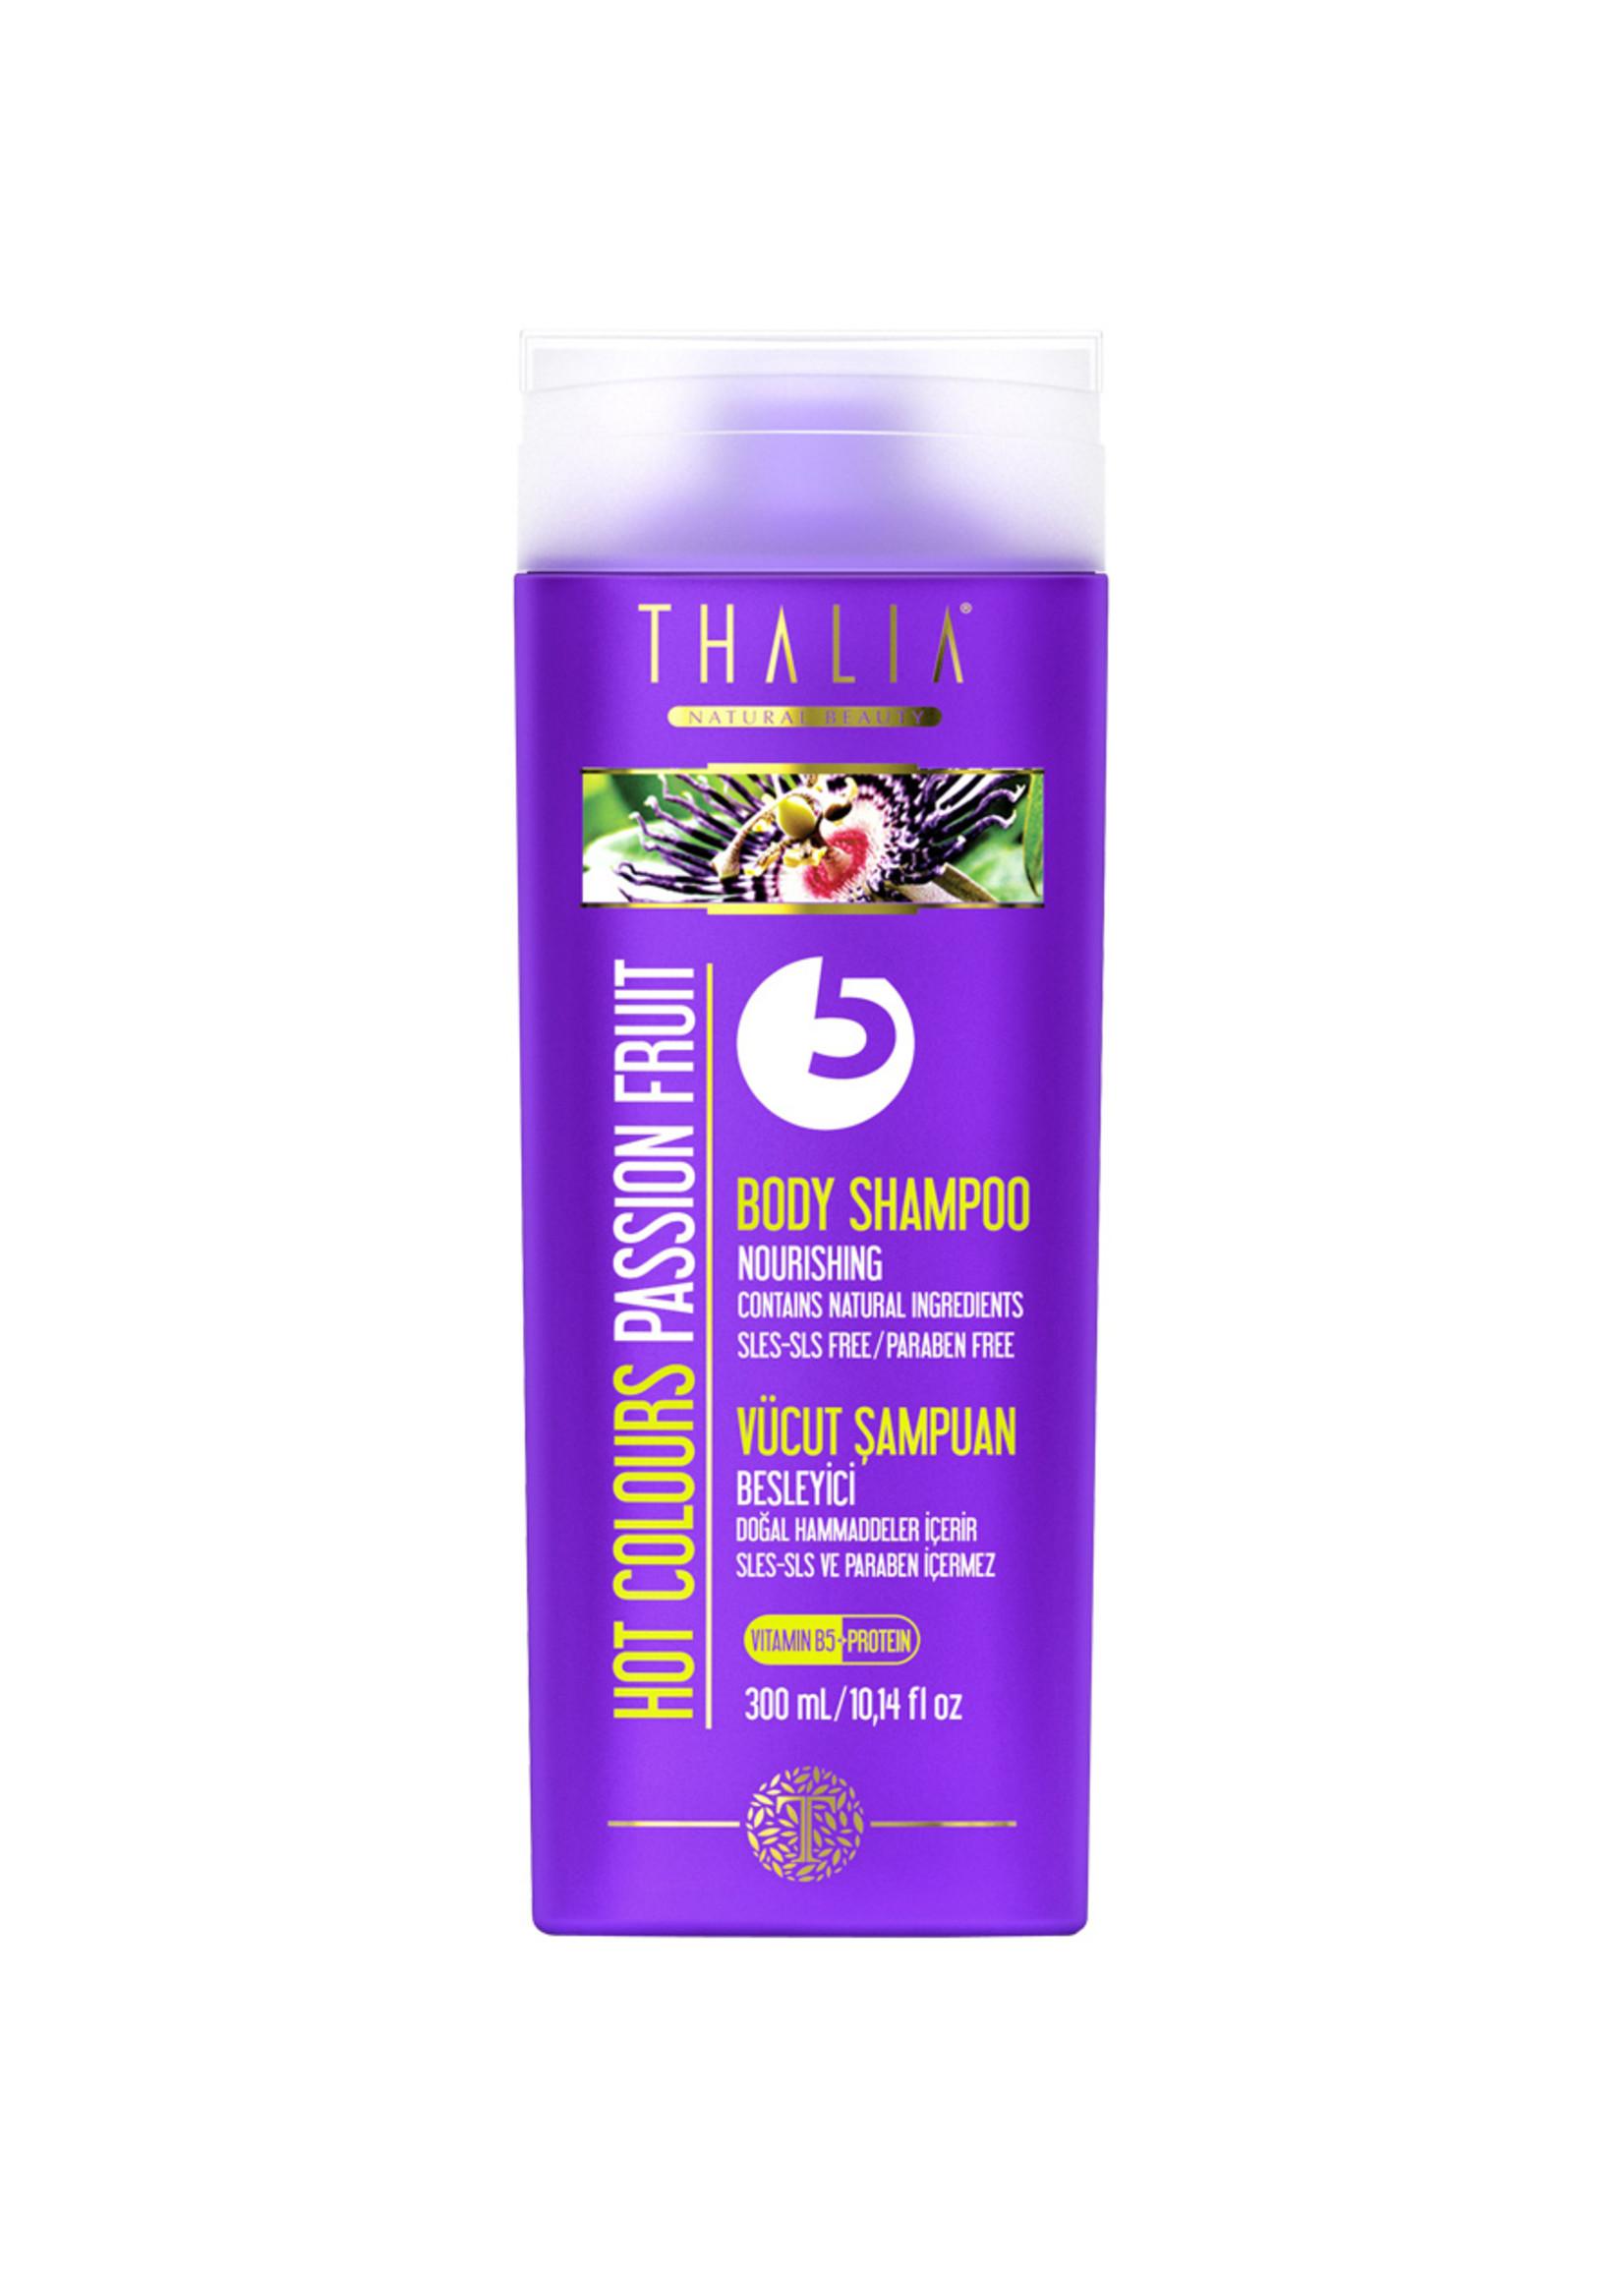 Thalia Passievrucht Body Shampoo 300 ml